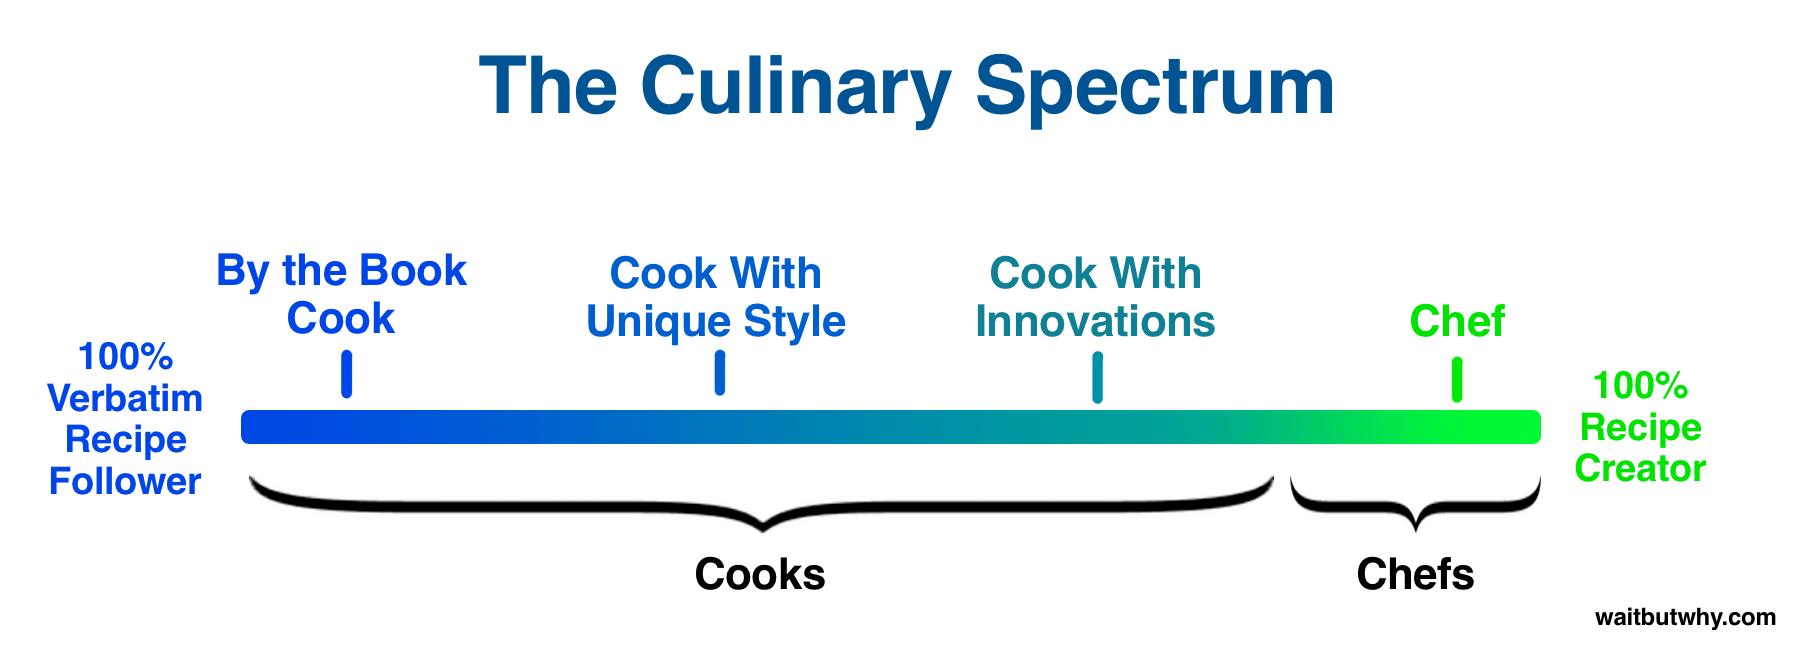 chef-cook-spectrum2